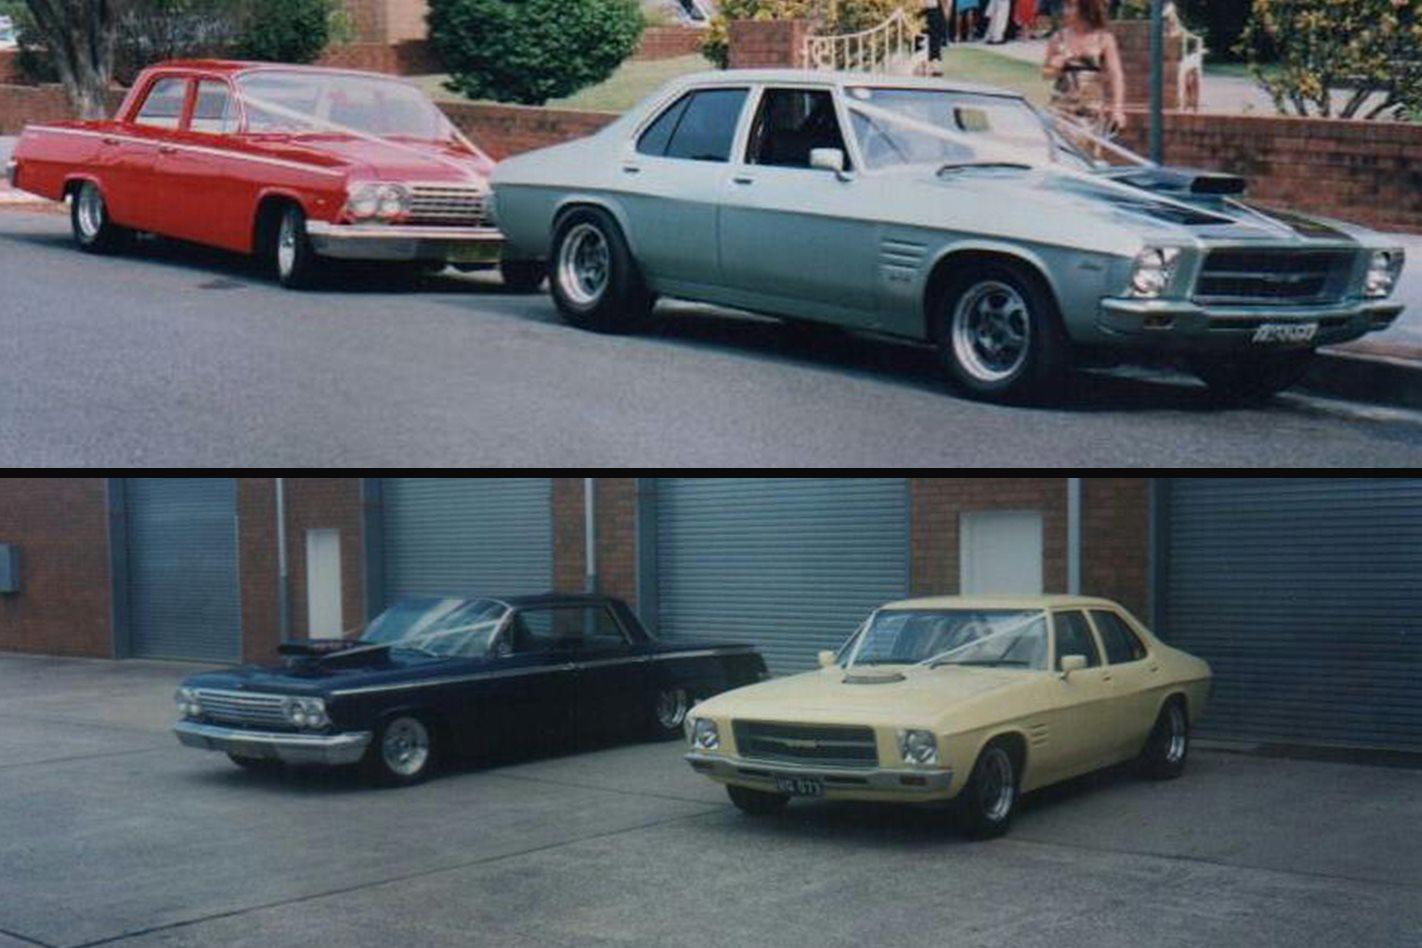 Bob Tipping's wedding cars